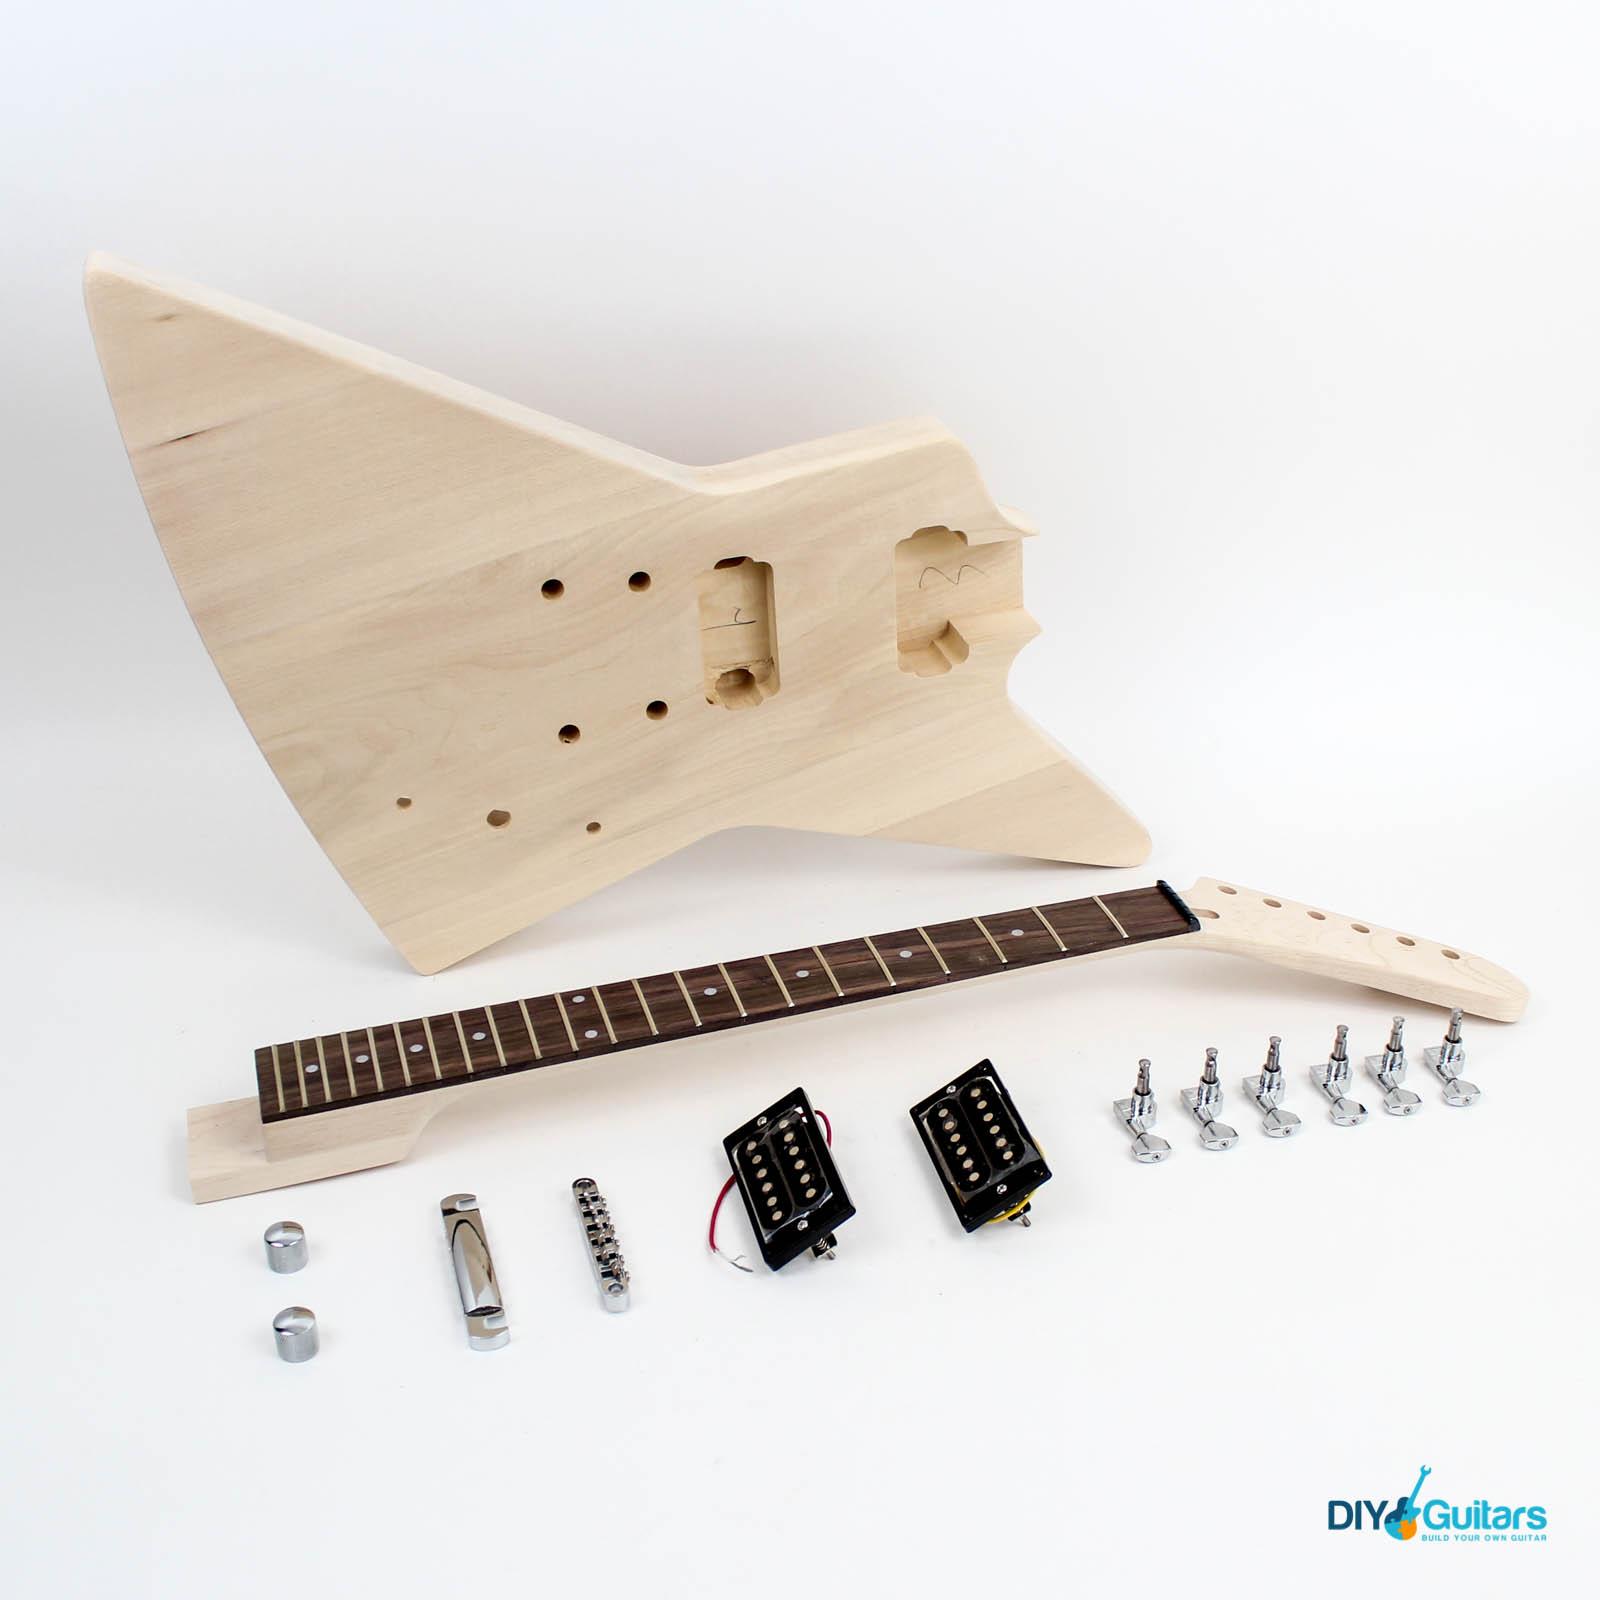 Gibson explorer guitar kit diy guitars solutioingenieria Image collections